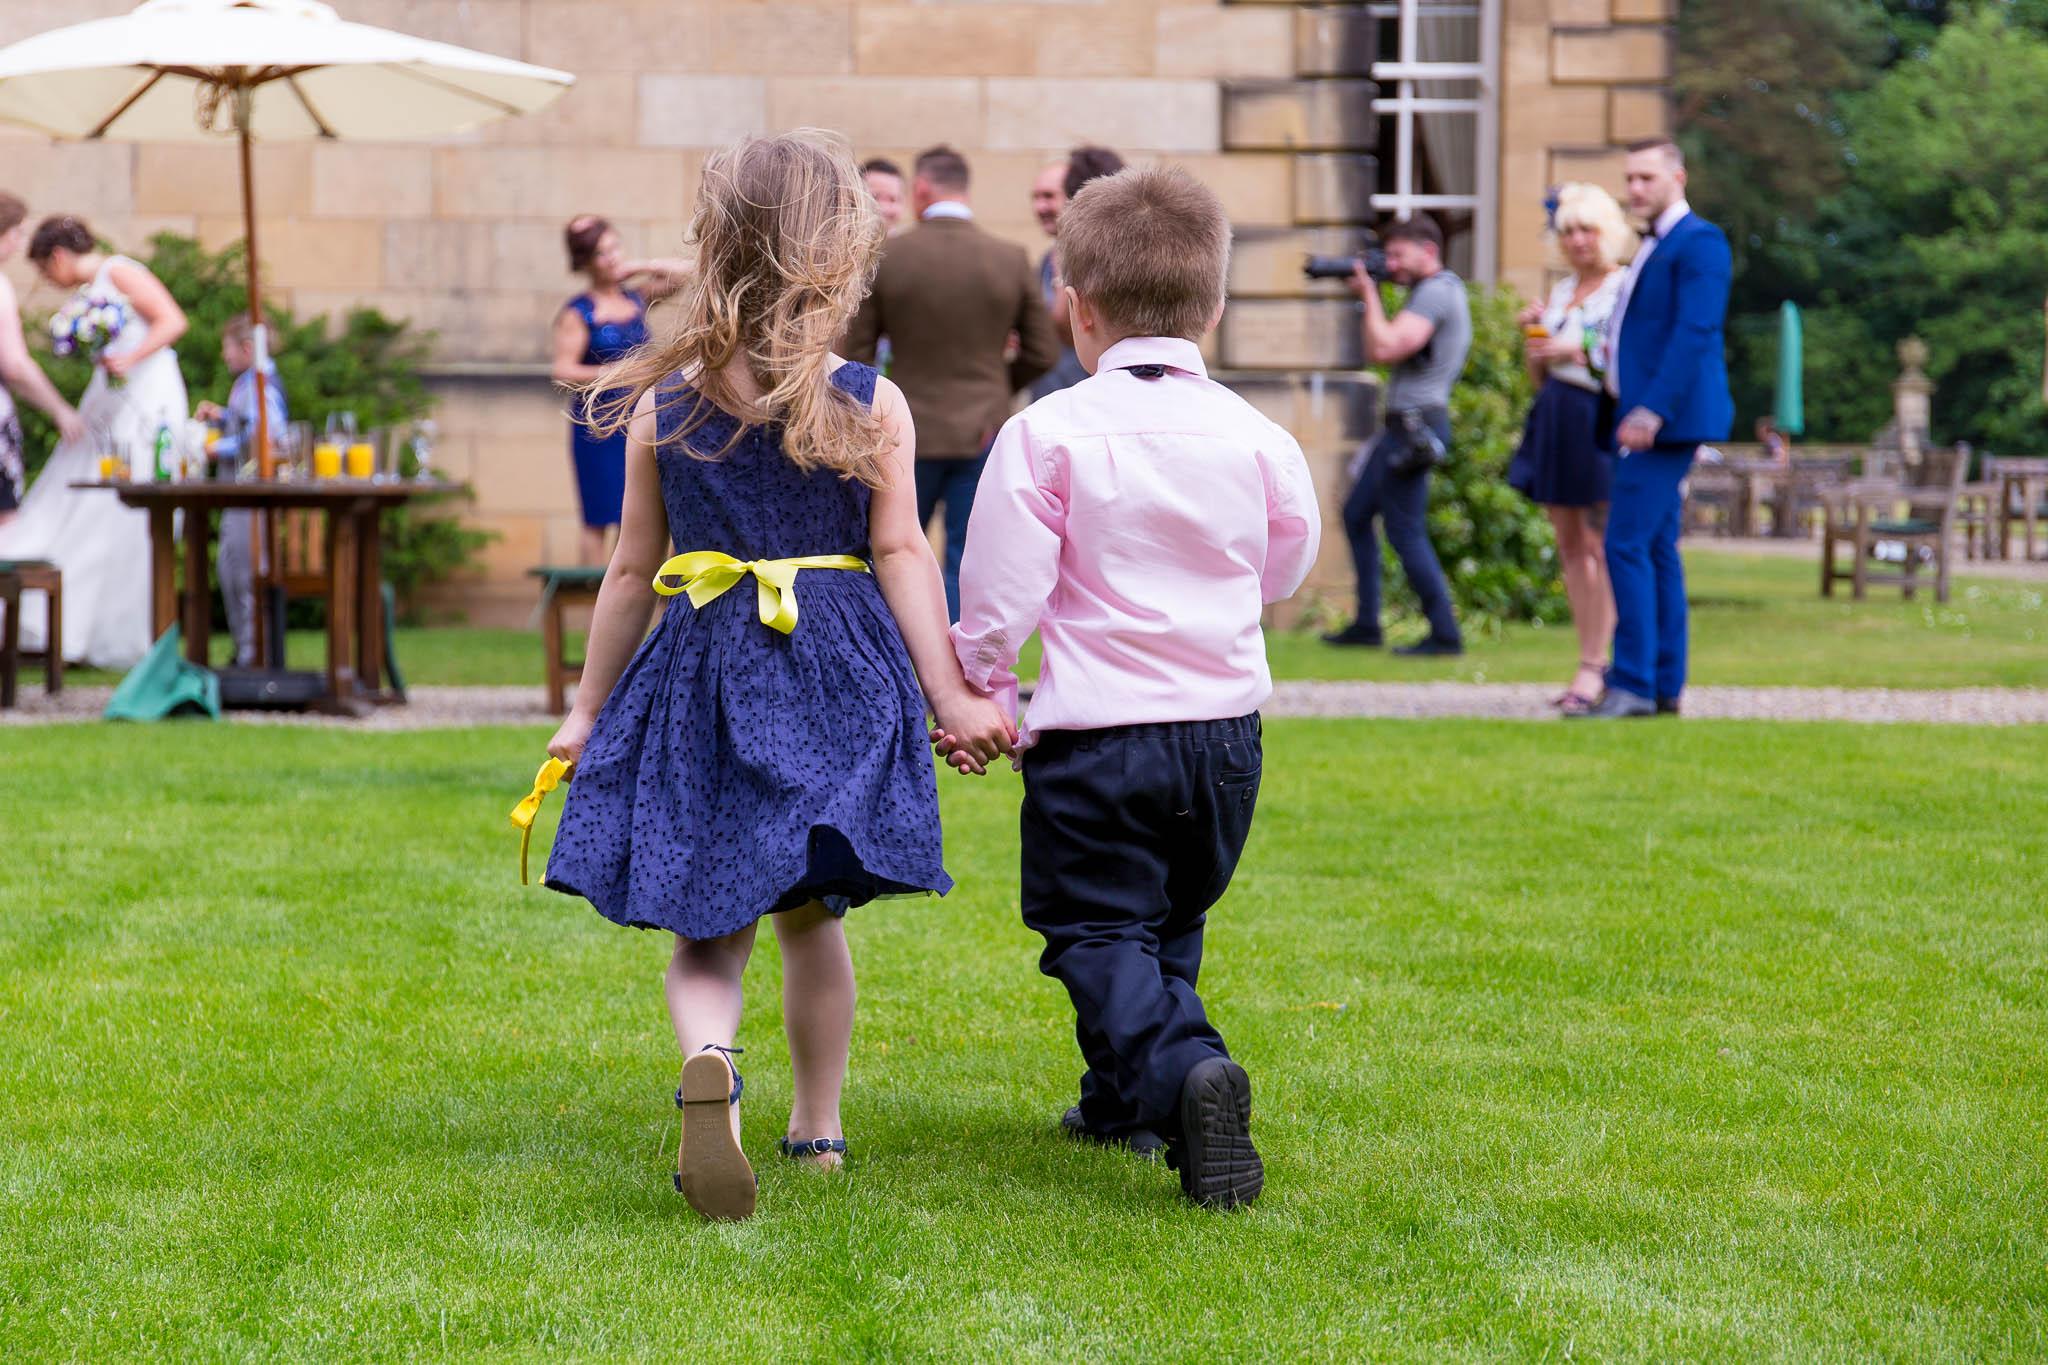 Crathorne Hall Hotel Wedding Photographer69.jpg